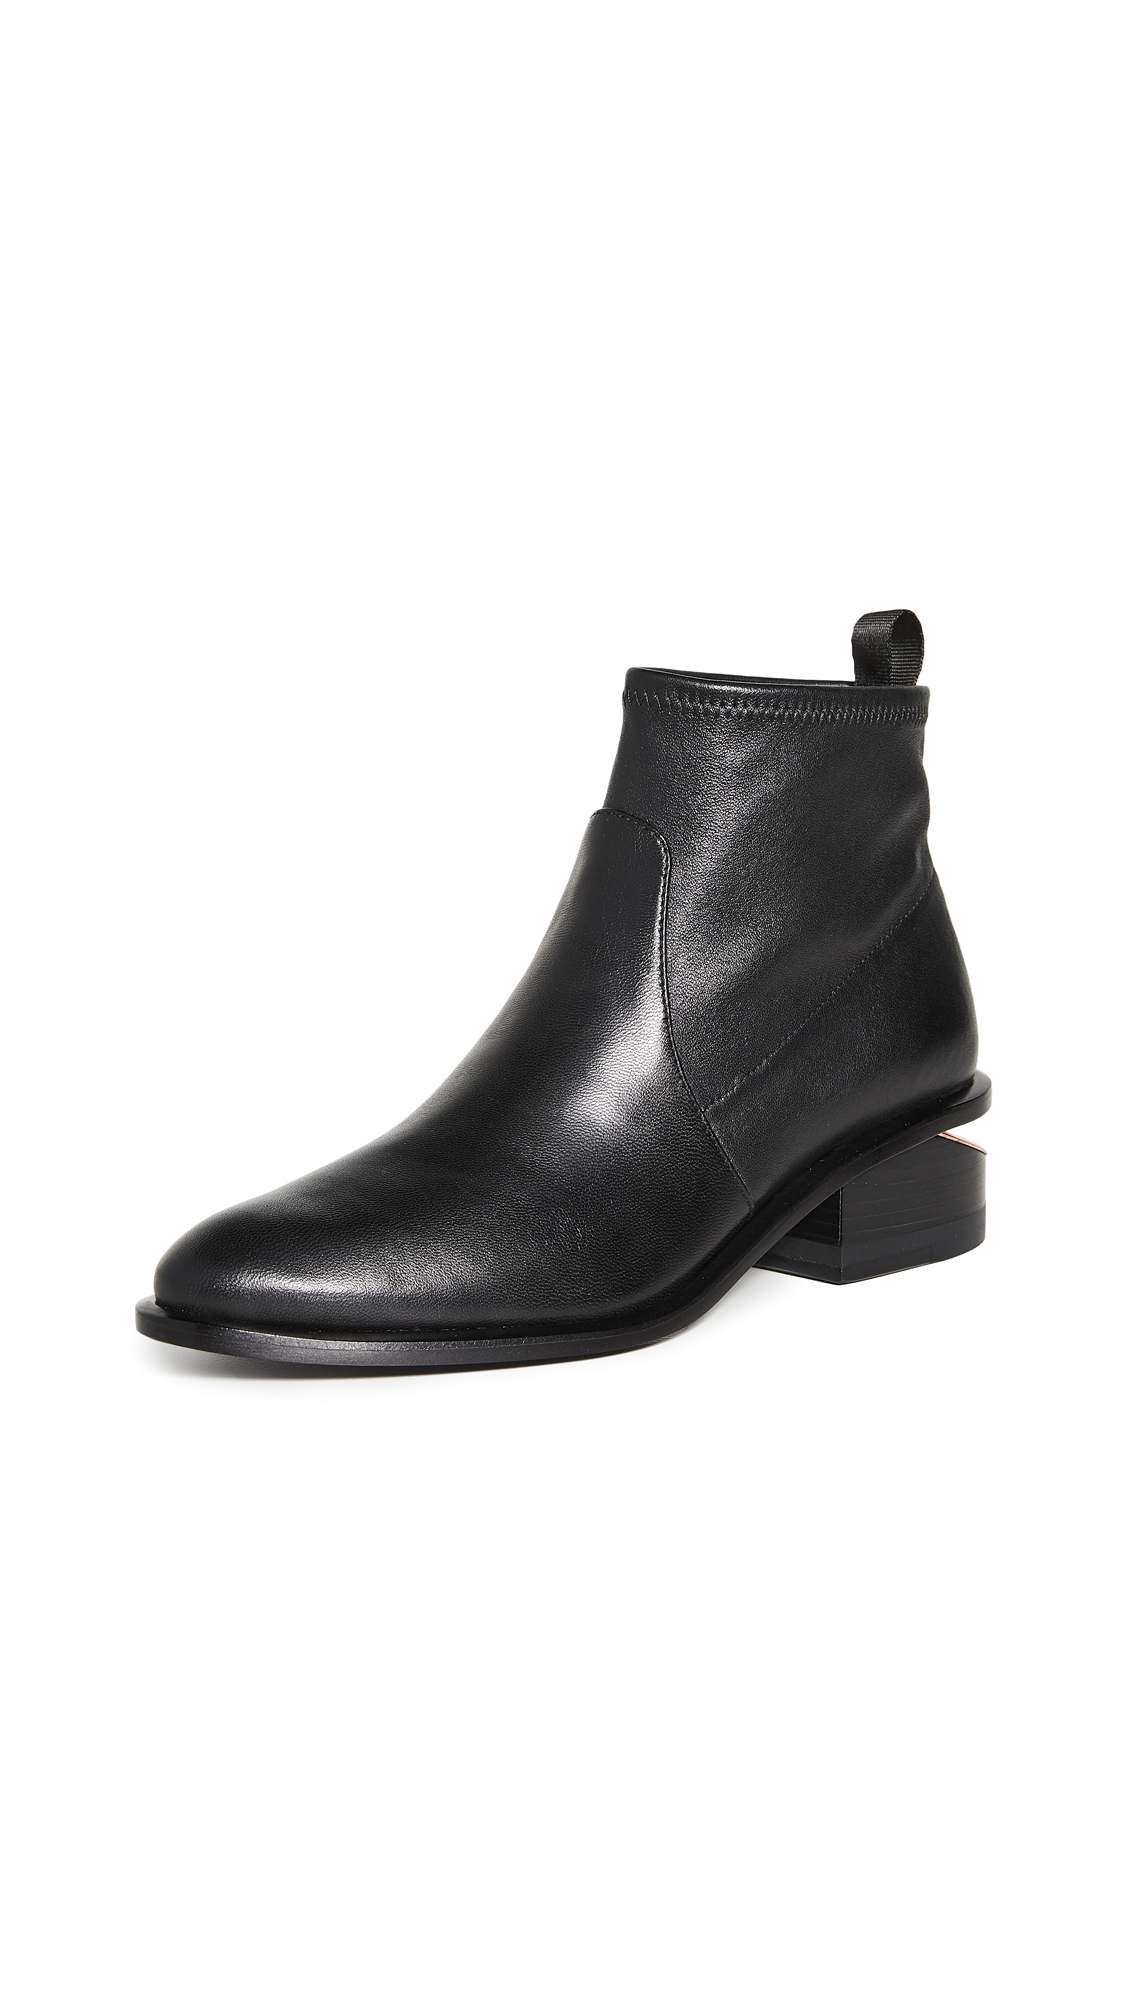 Buy Alexander Wang Kori Booties online, shop Alexander Wang